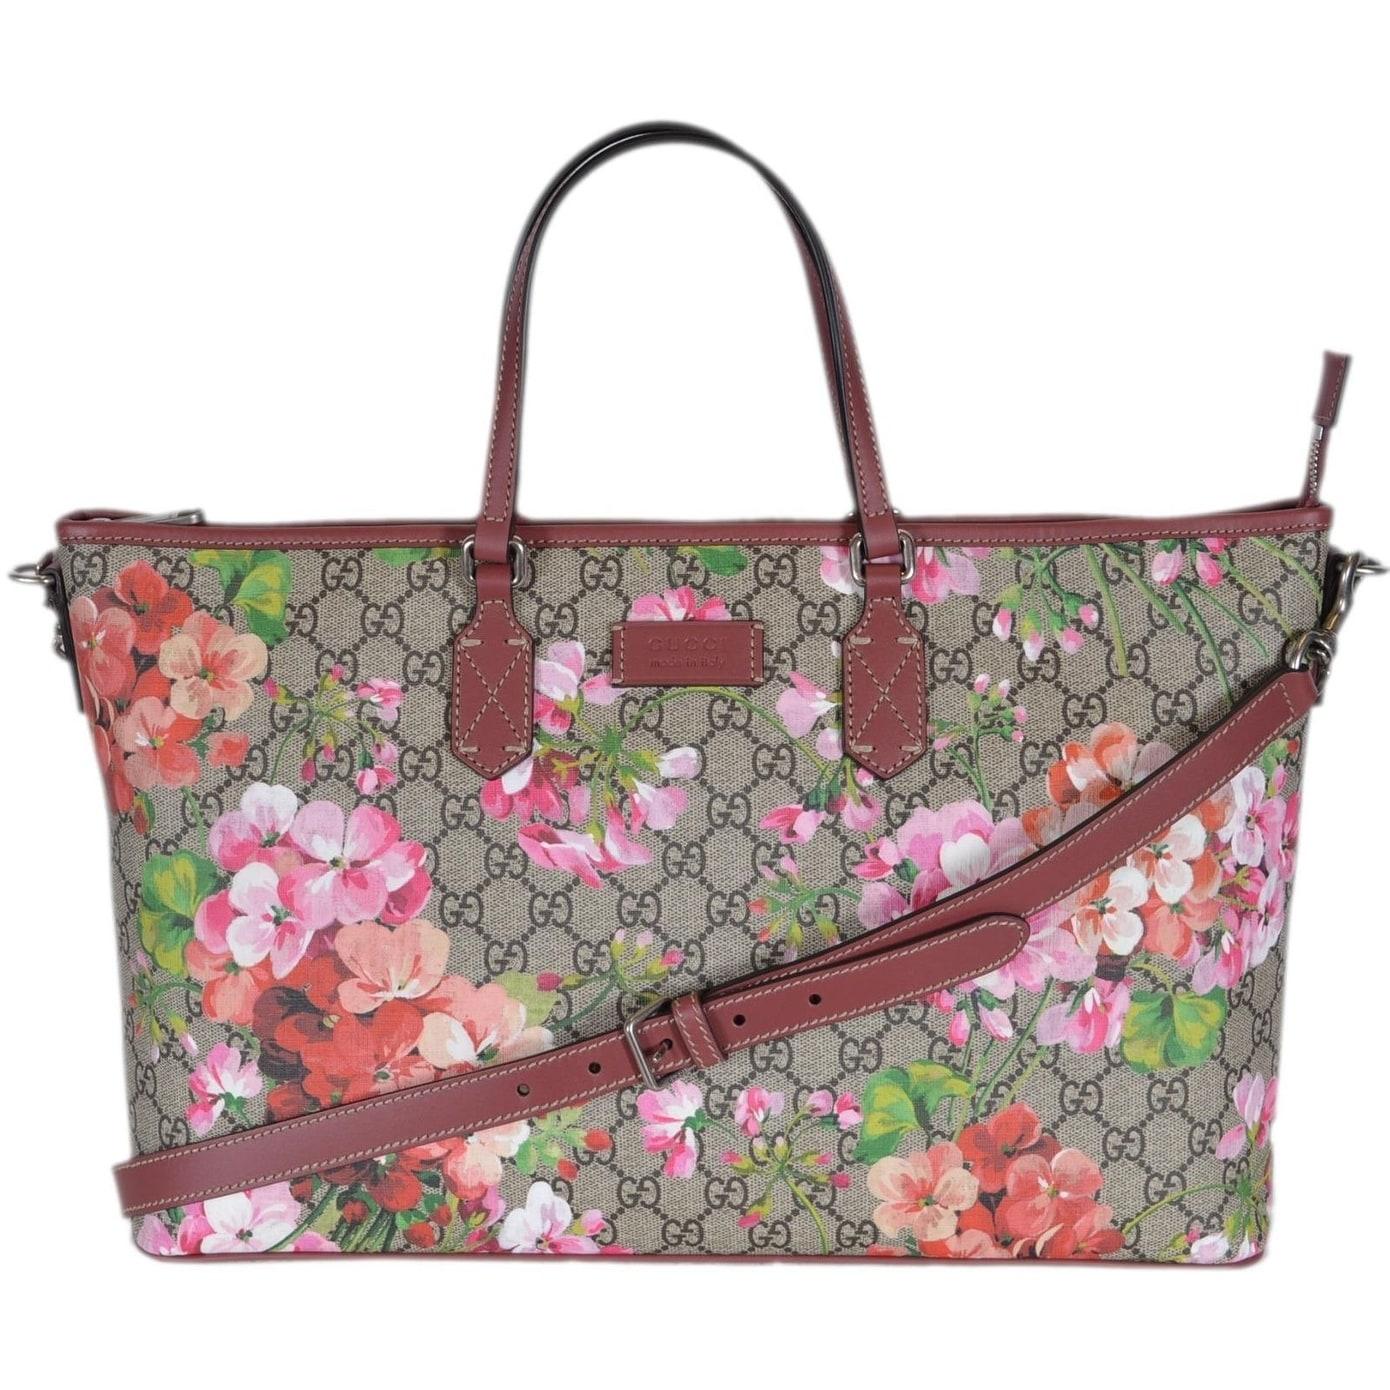 Shop Gucci 410478 Gg Supreme Canvas Pink Floral Blooms Convertible